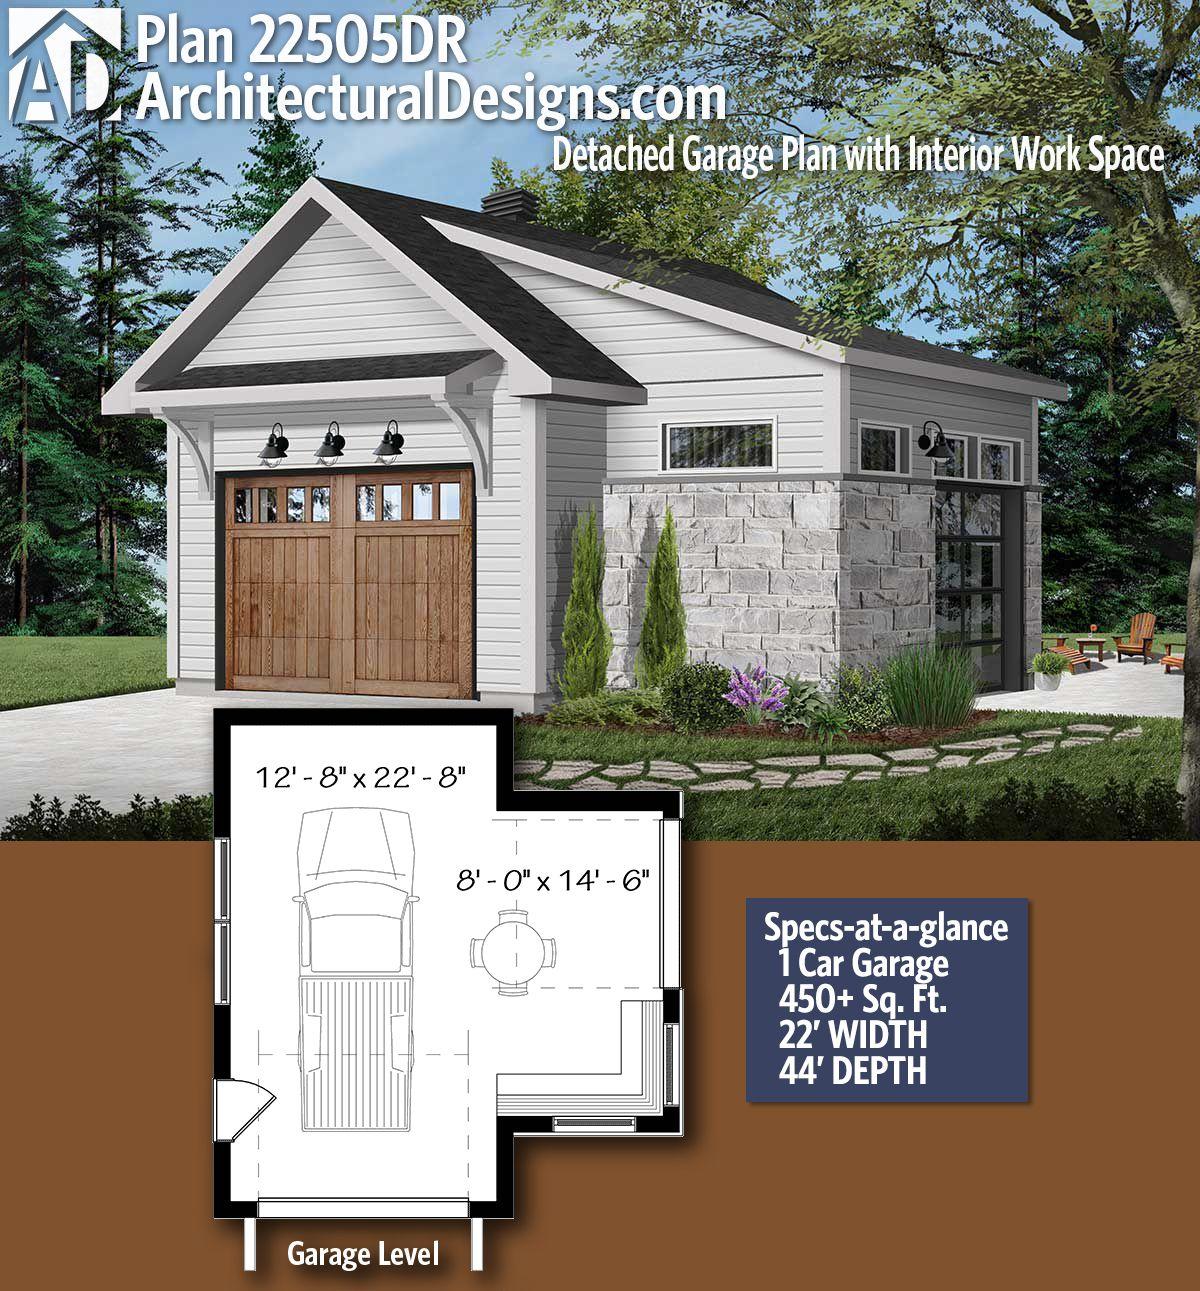 Plan 22505dr Detached Garage Plan With Interior Work Space Garage Plans Detached Detached Garage Designs Detached Garage